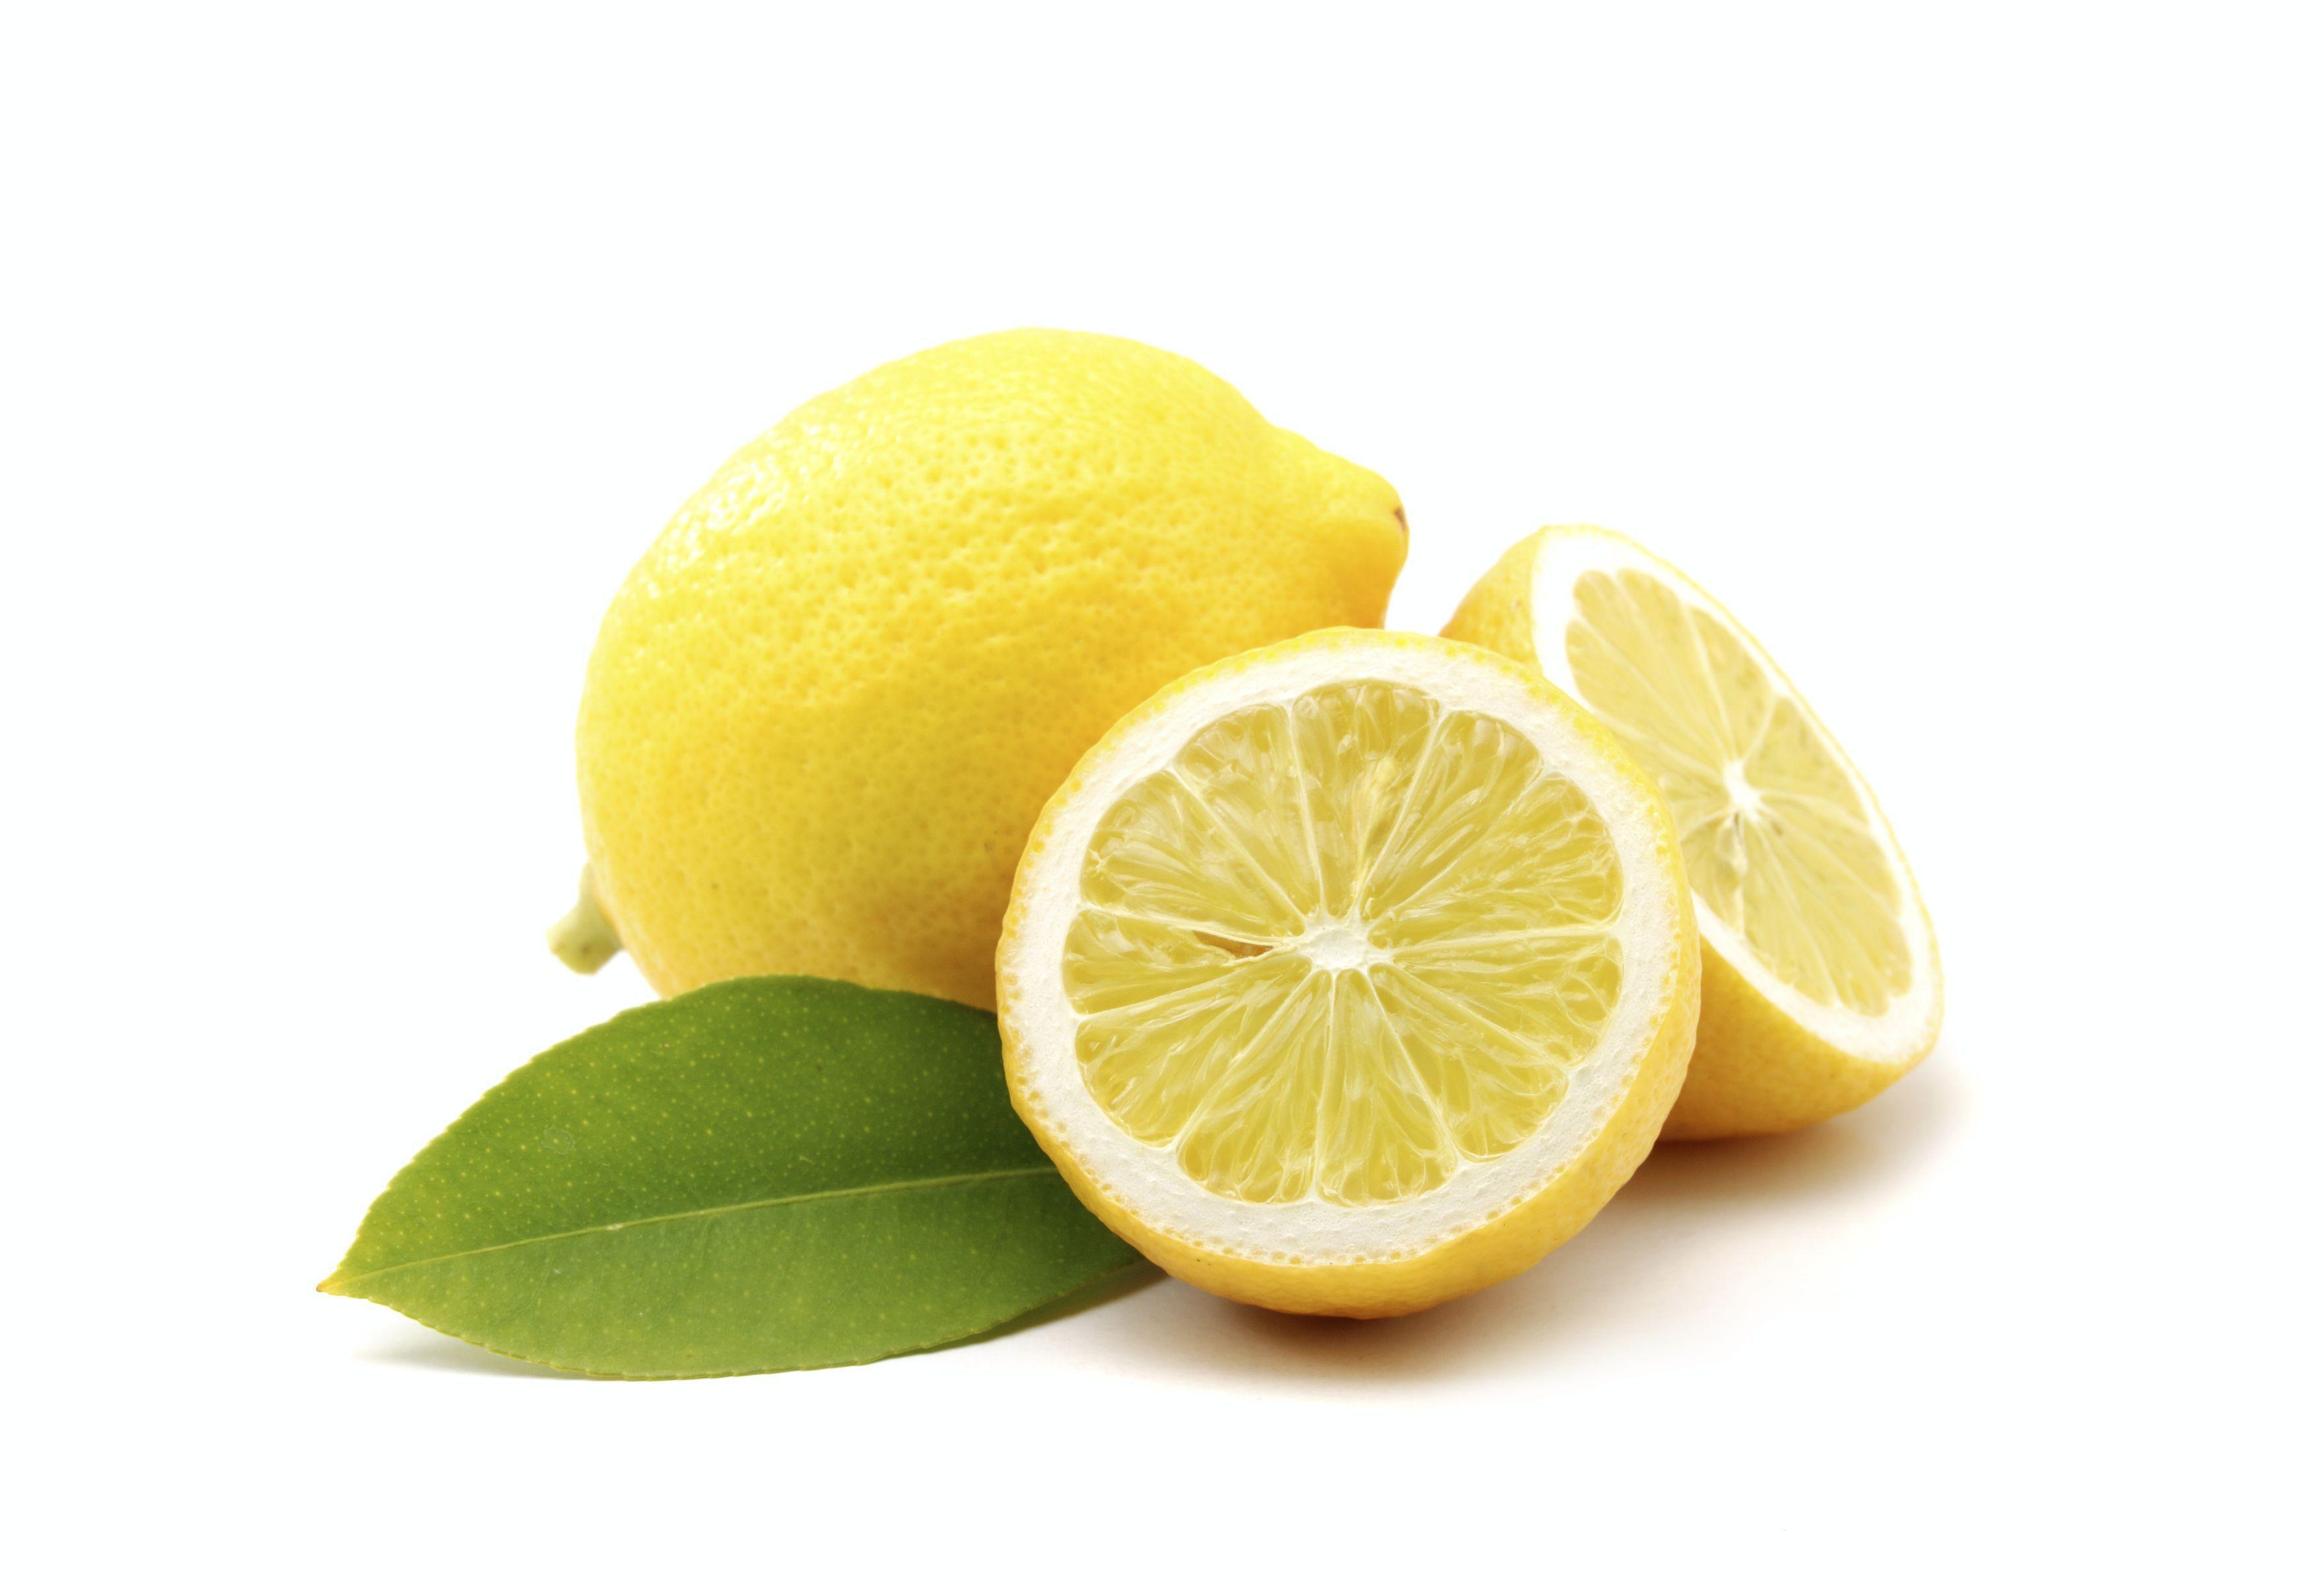 Lemon High Quality Wallpapers